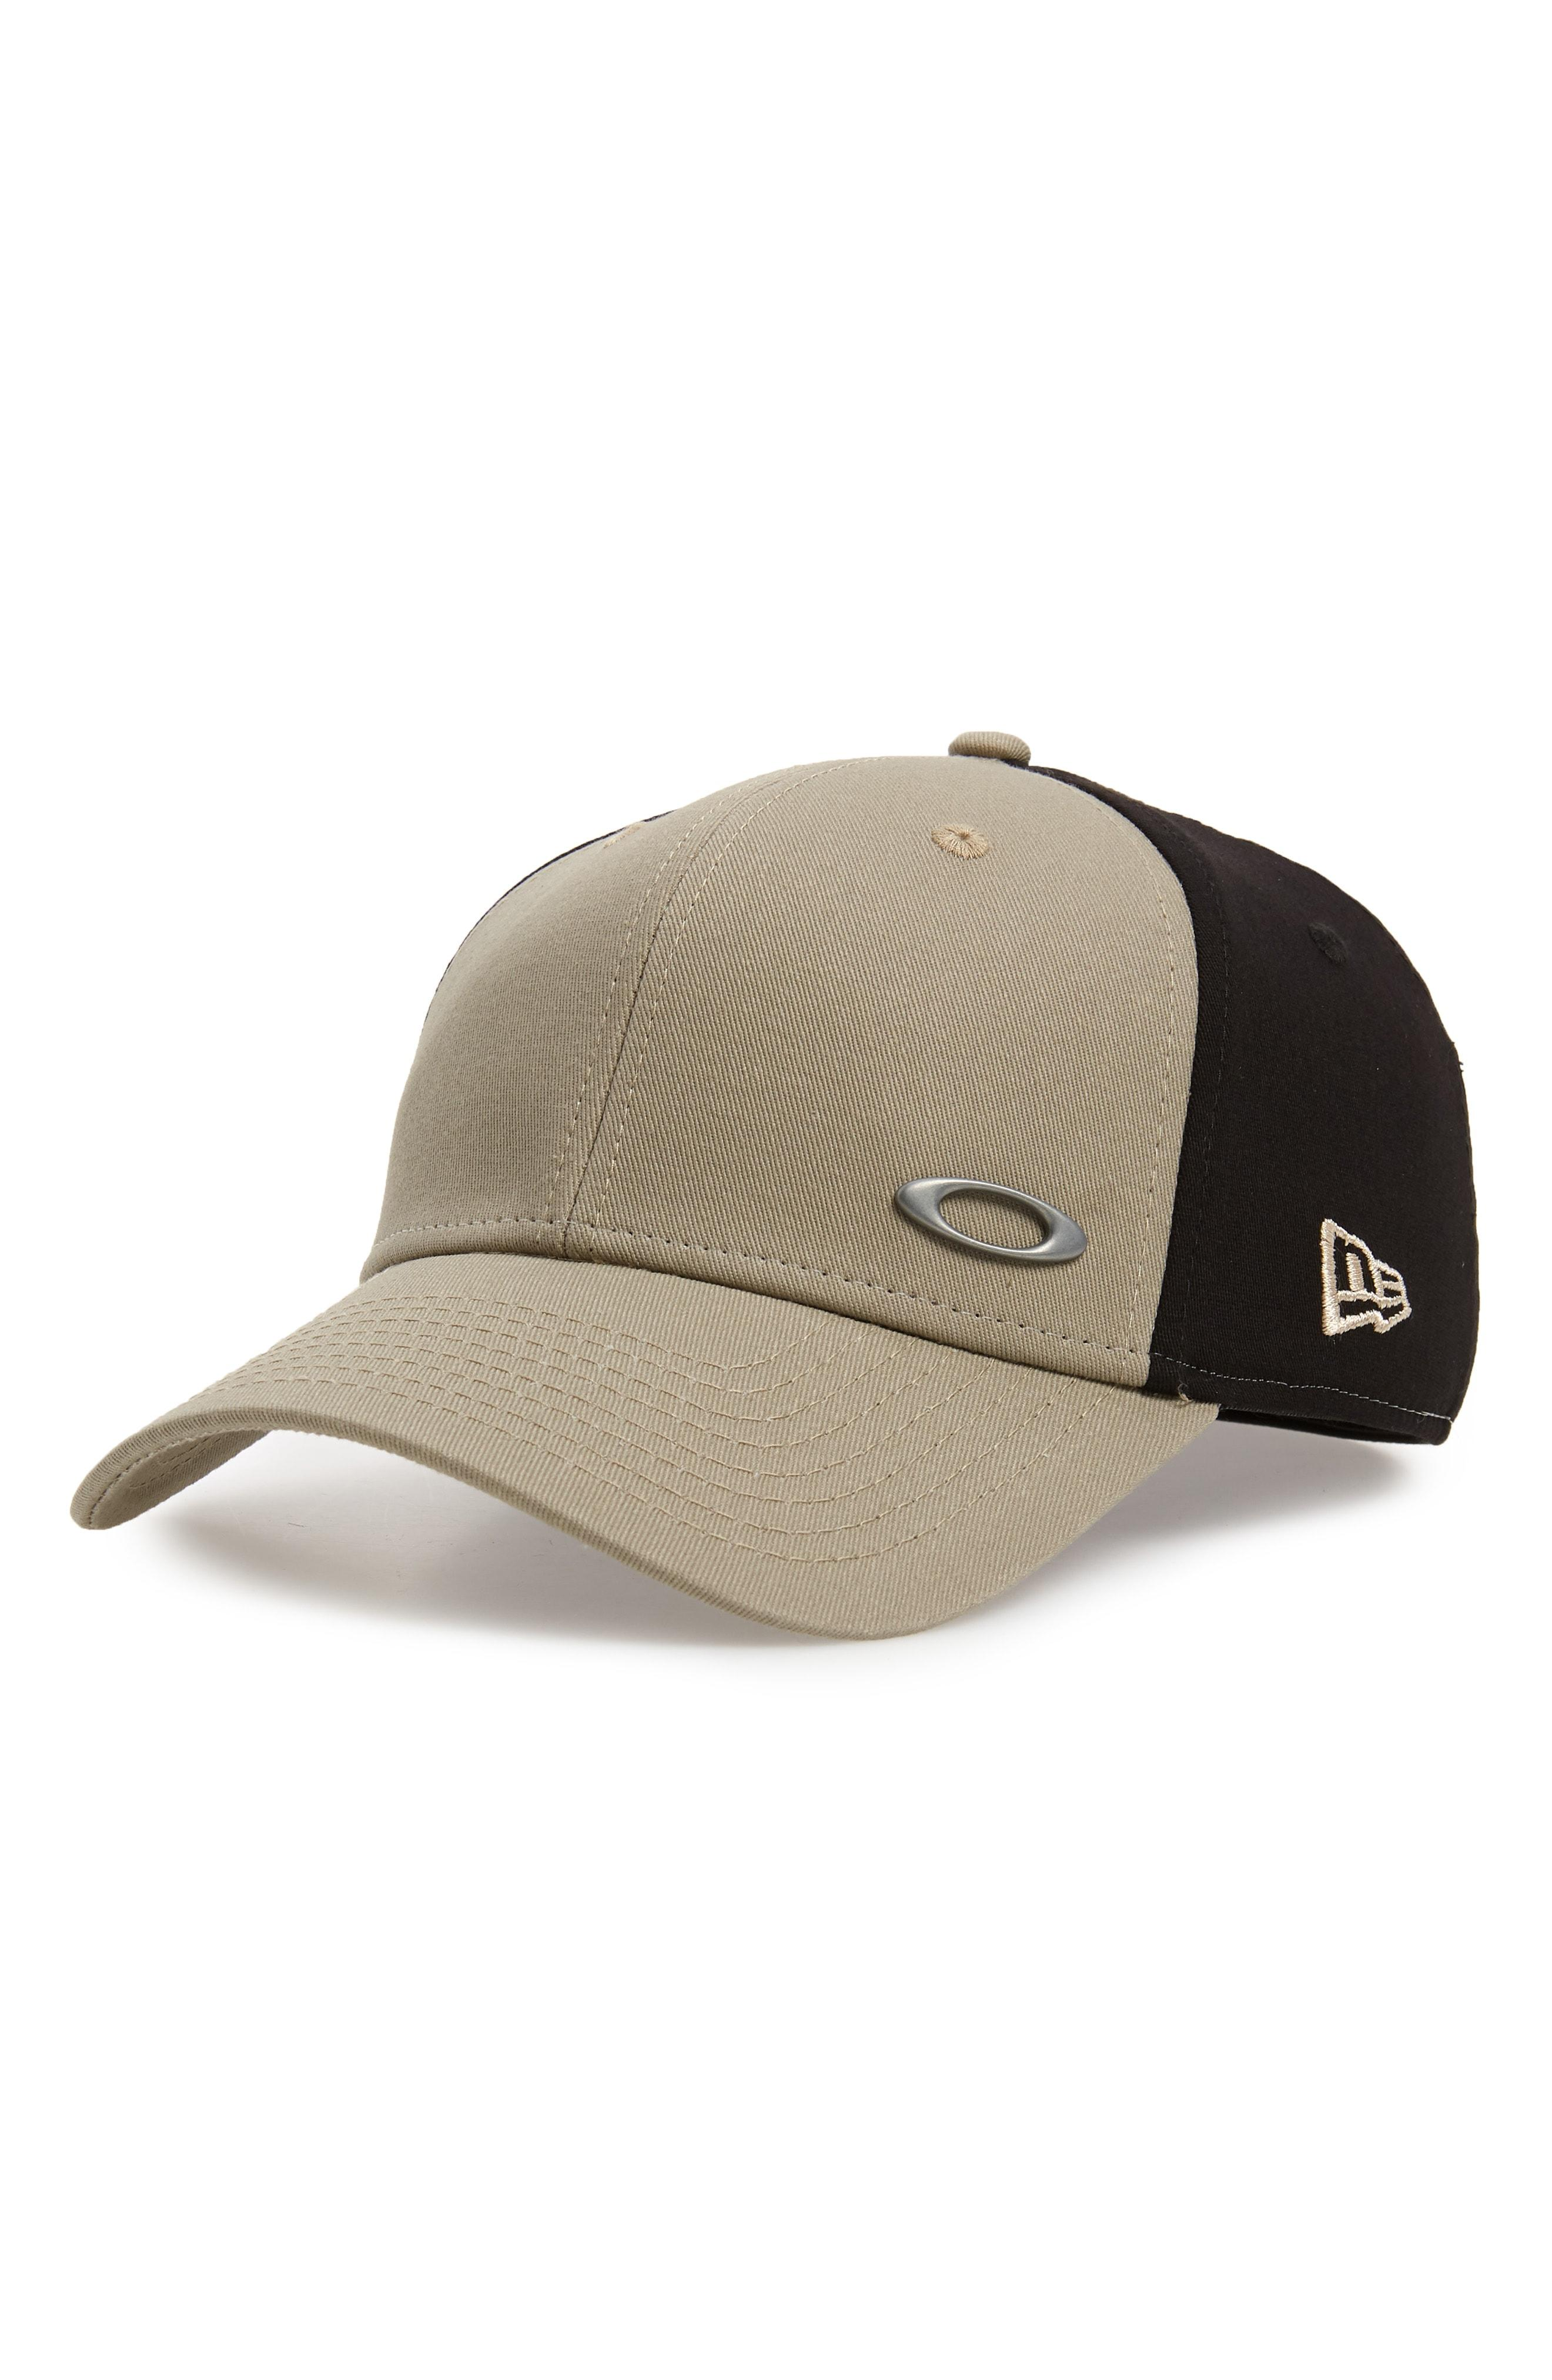 Oakley - Multicolor Tinfoil Baseball Cap for Men - Lyst. View fullscreen 16baba999c13